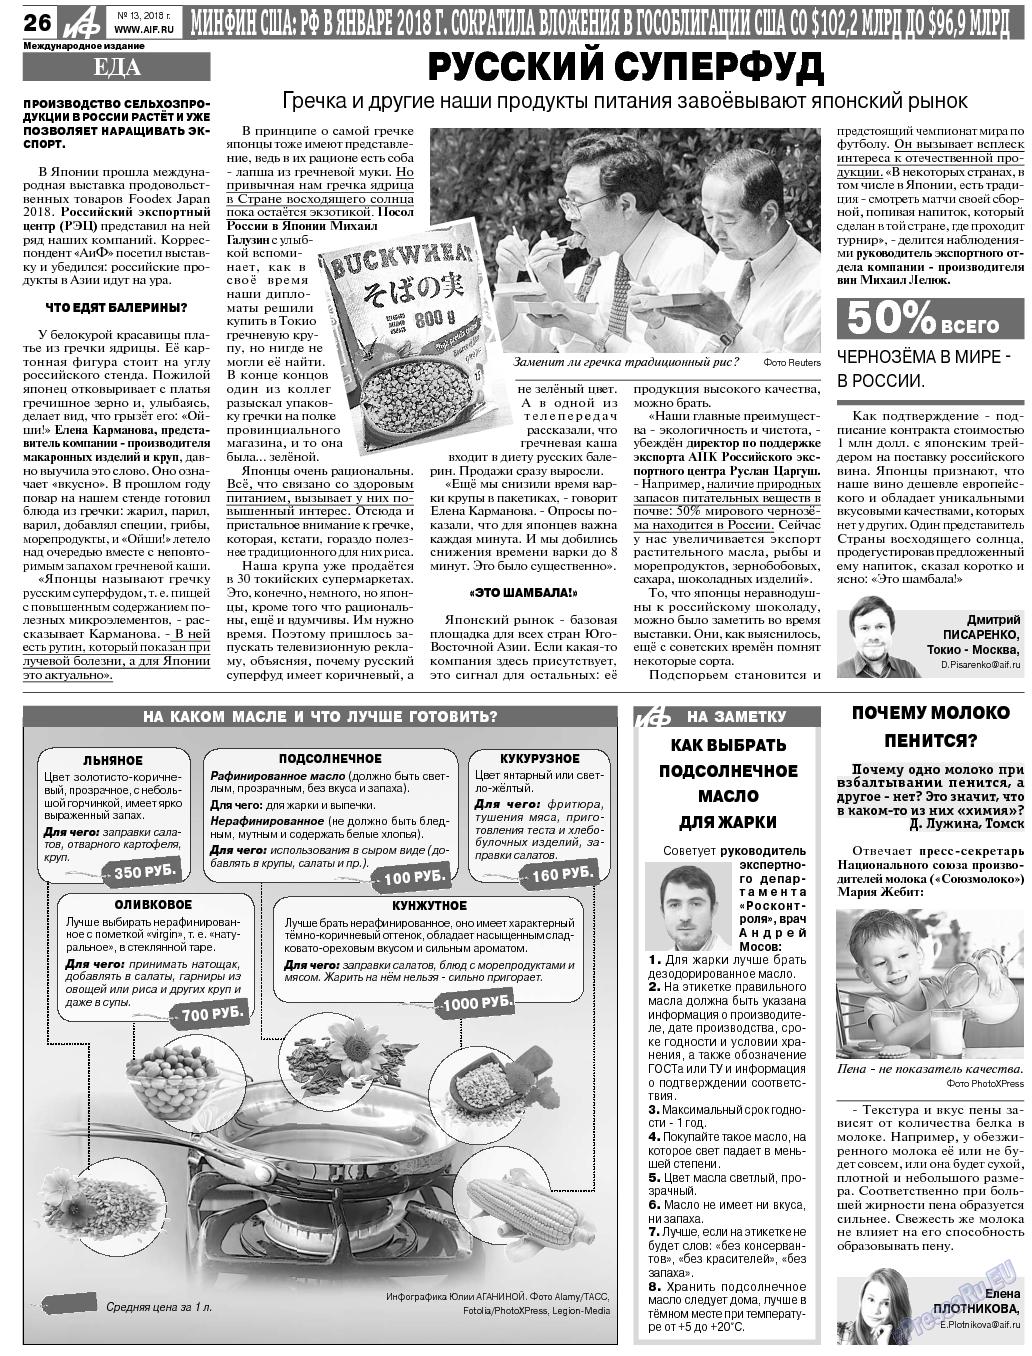 Аргументы и факты Европа (газета). 2018 год, номер 13, стр. 30